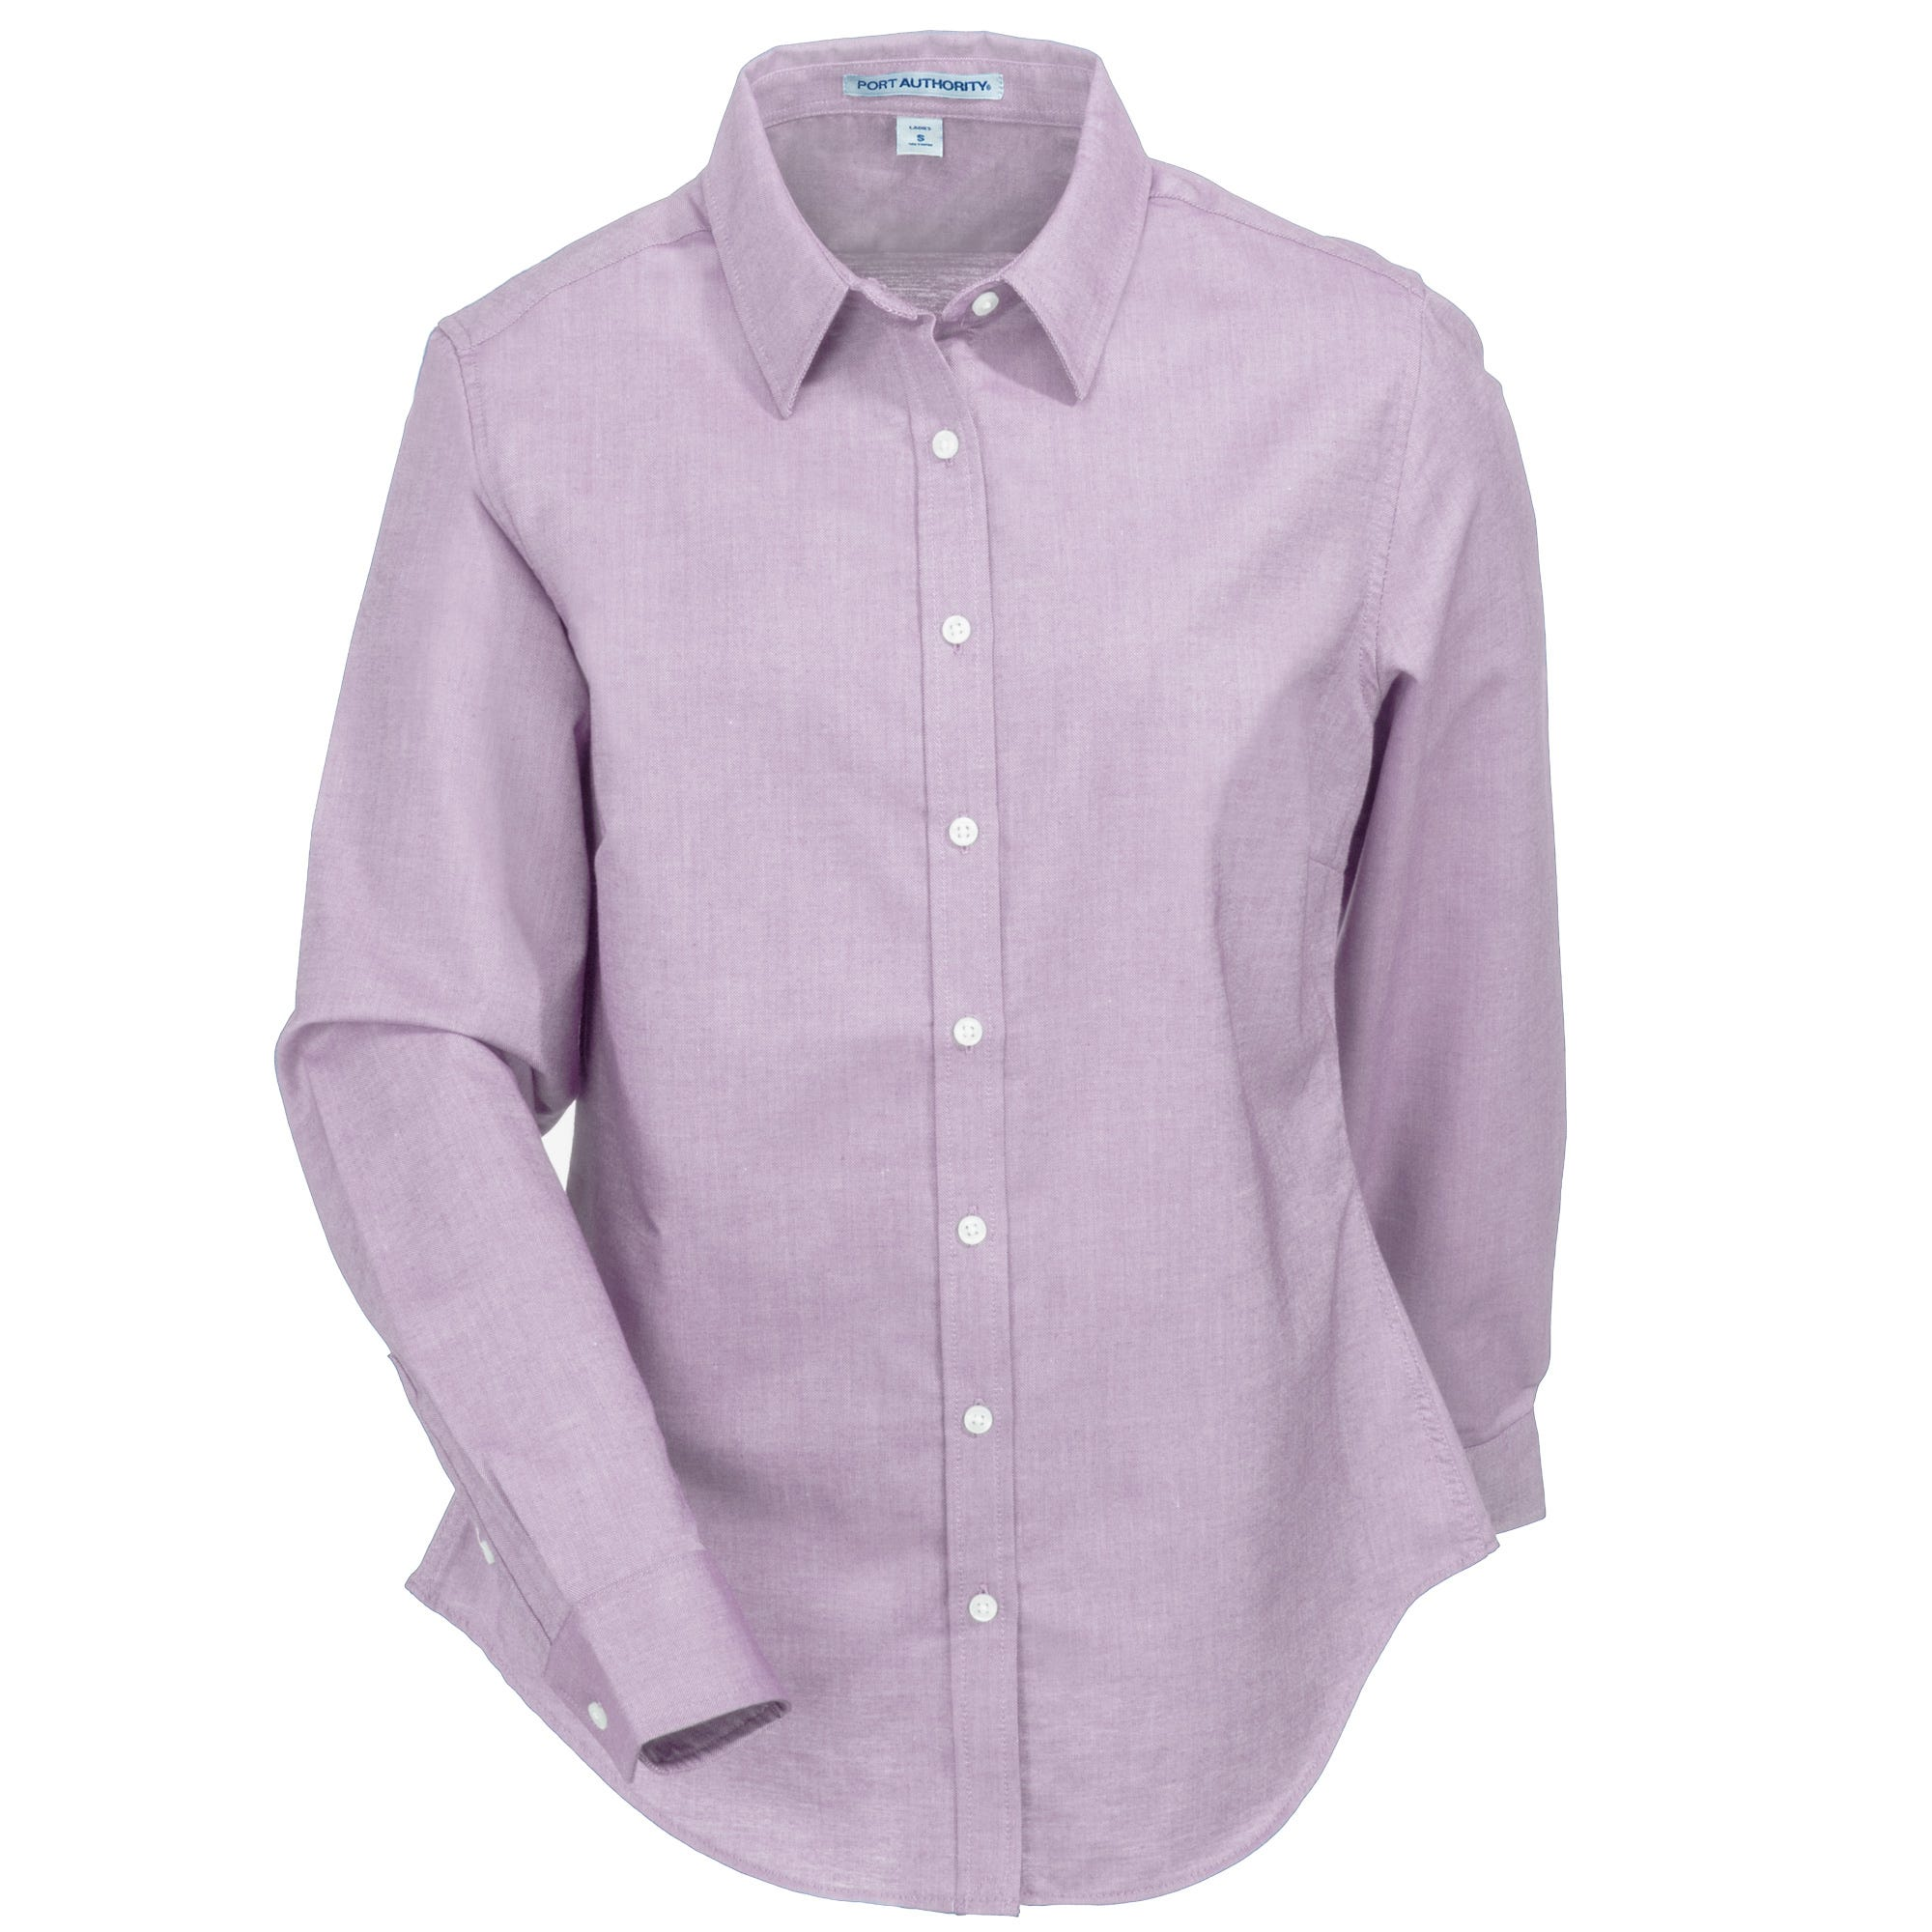 Port Authority Women's L658 SPL Soft Purple SuperPro Long-Sleeve Oxford Shirt